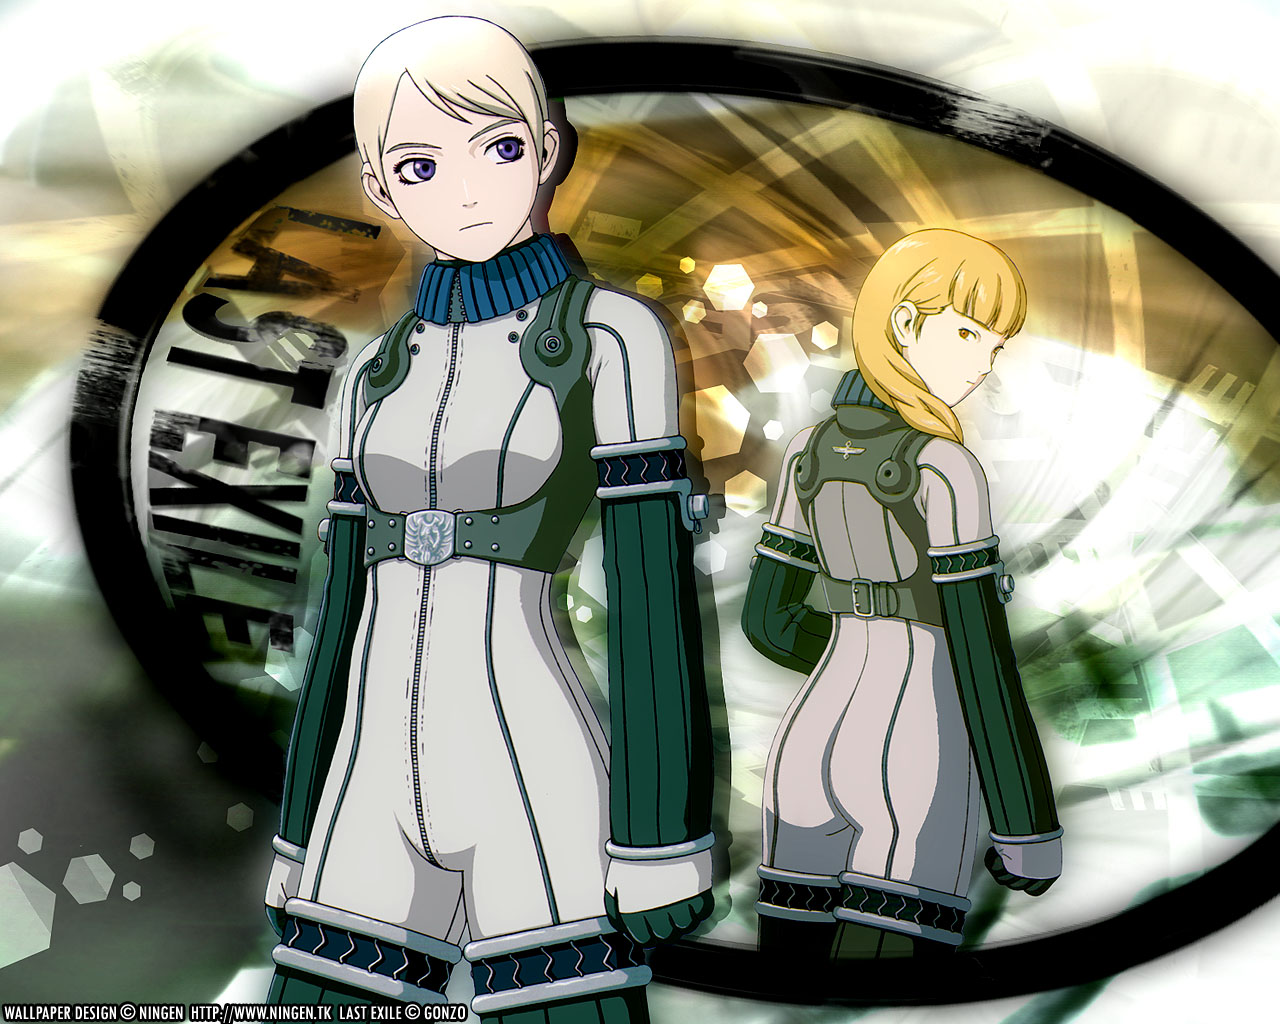 Anime Last Exile Wallpaper 1280x1024 Anime Last Exile 1280x1024